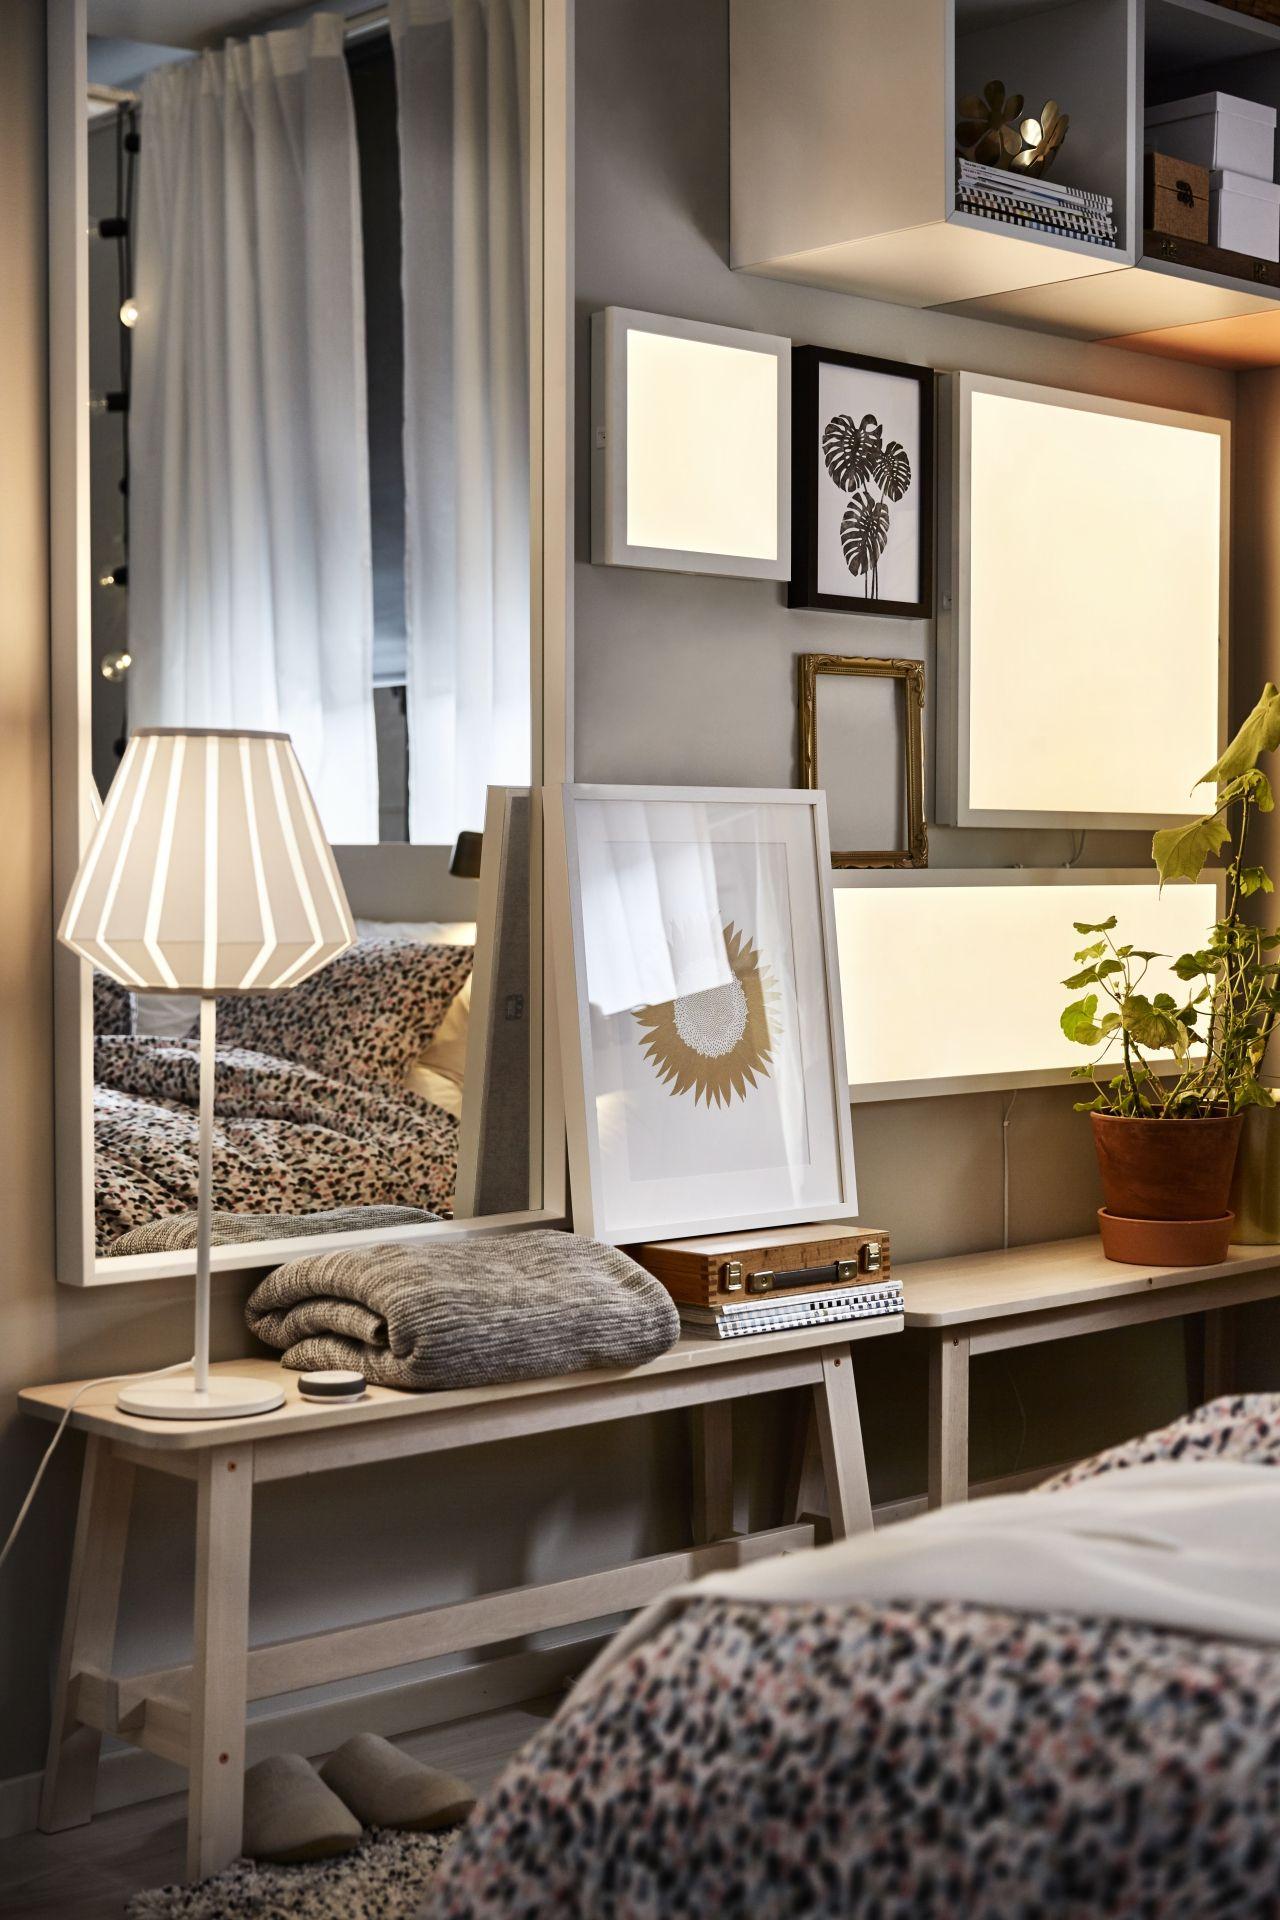 FLOALT led-lichtpaneel | IKEAcatalogus nieuw 2018 IKEA IKEAnl ...